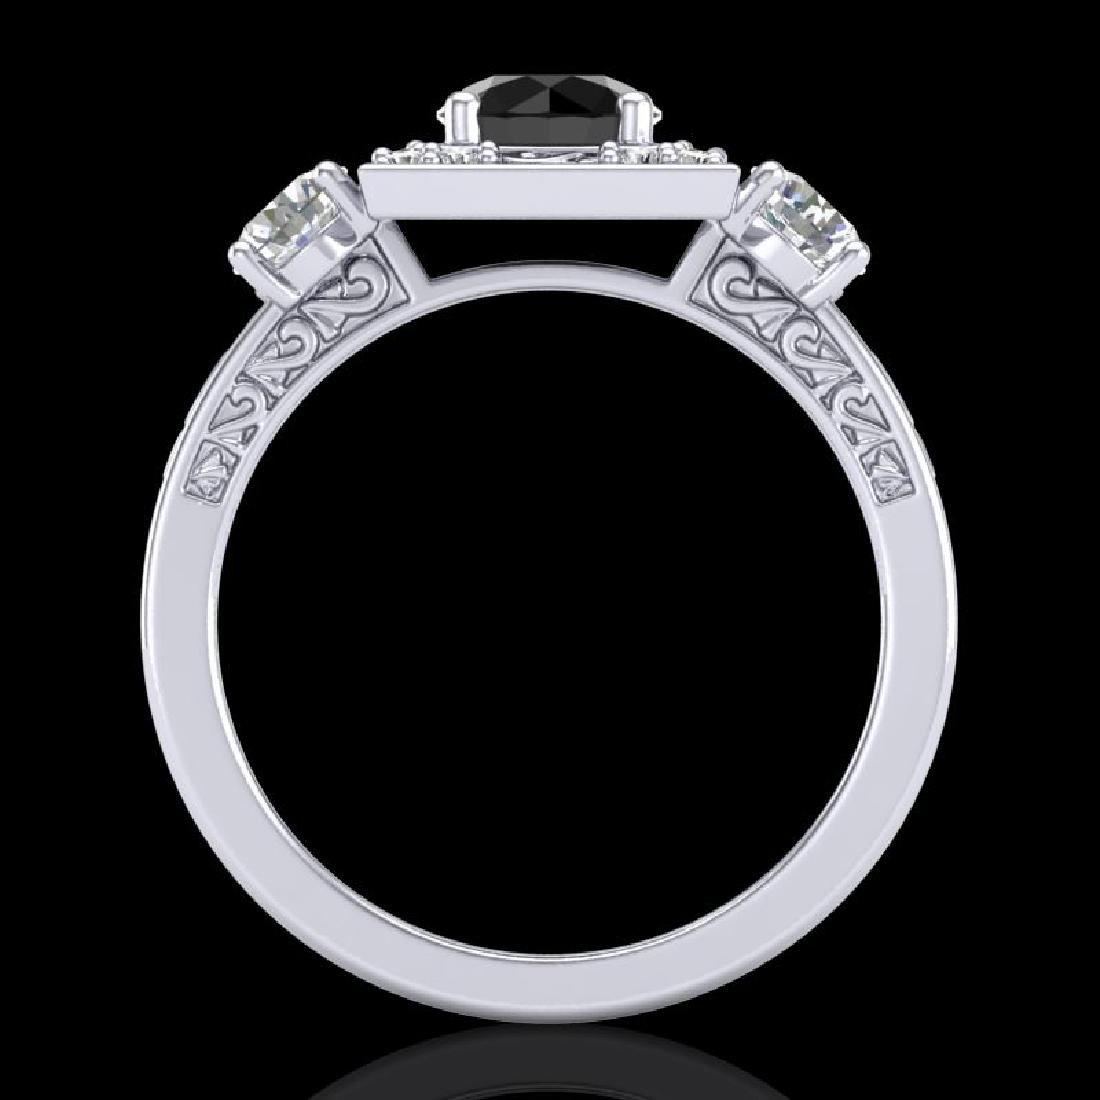 1.55 CTW Fancy Black Diamond Solitaire Art Deco 3 Stone - 3